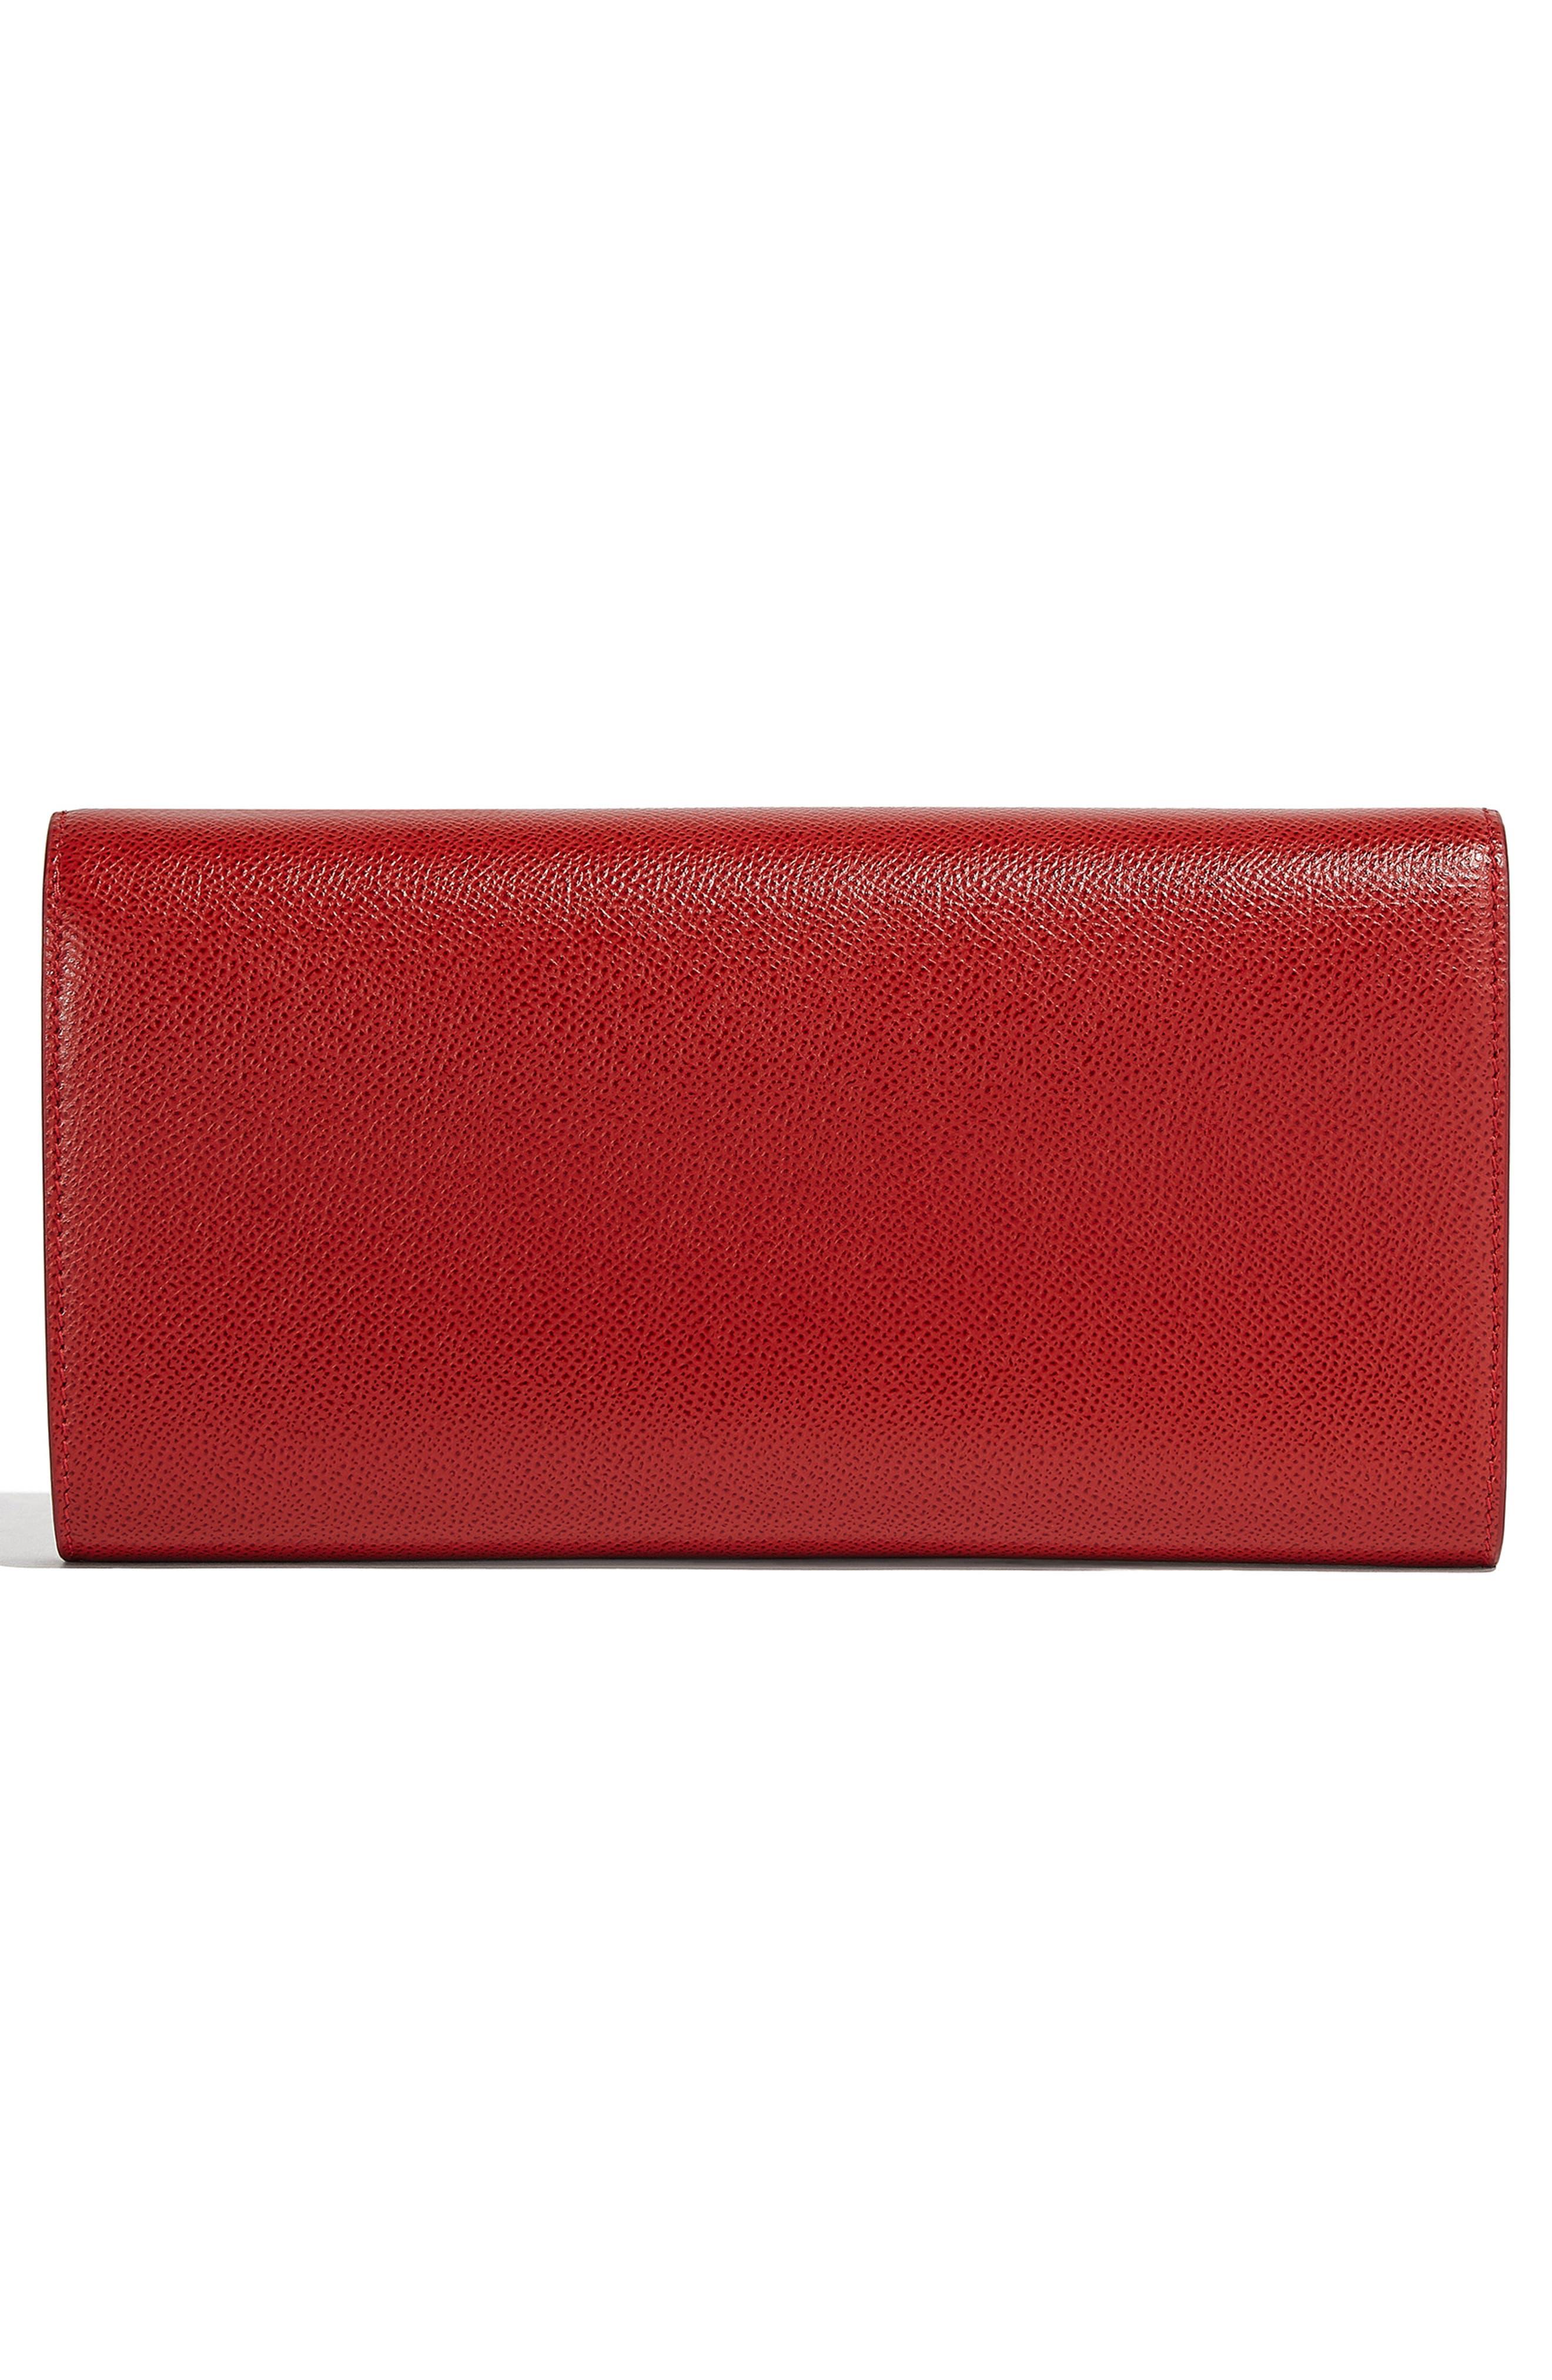 Gancio Calfskin Leather Clutch,                             Alternate thumbnail 2, color,                             LIPSTICK